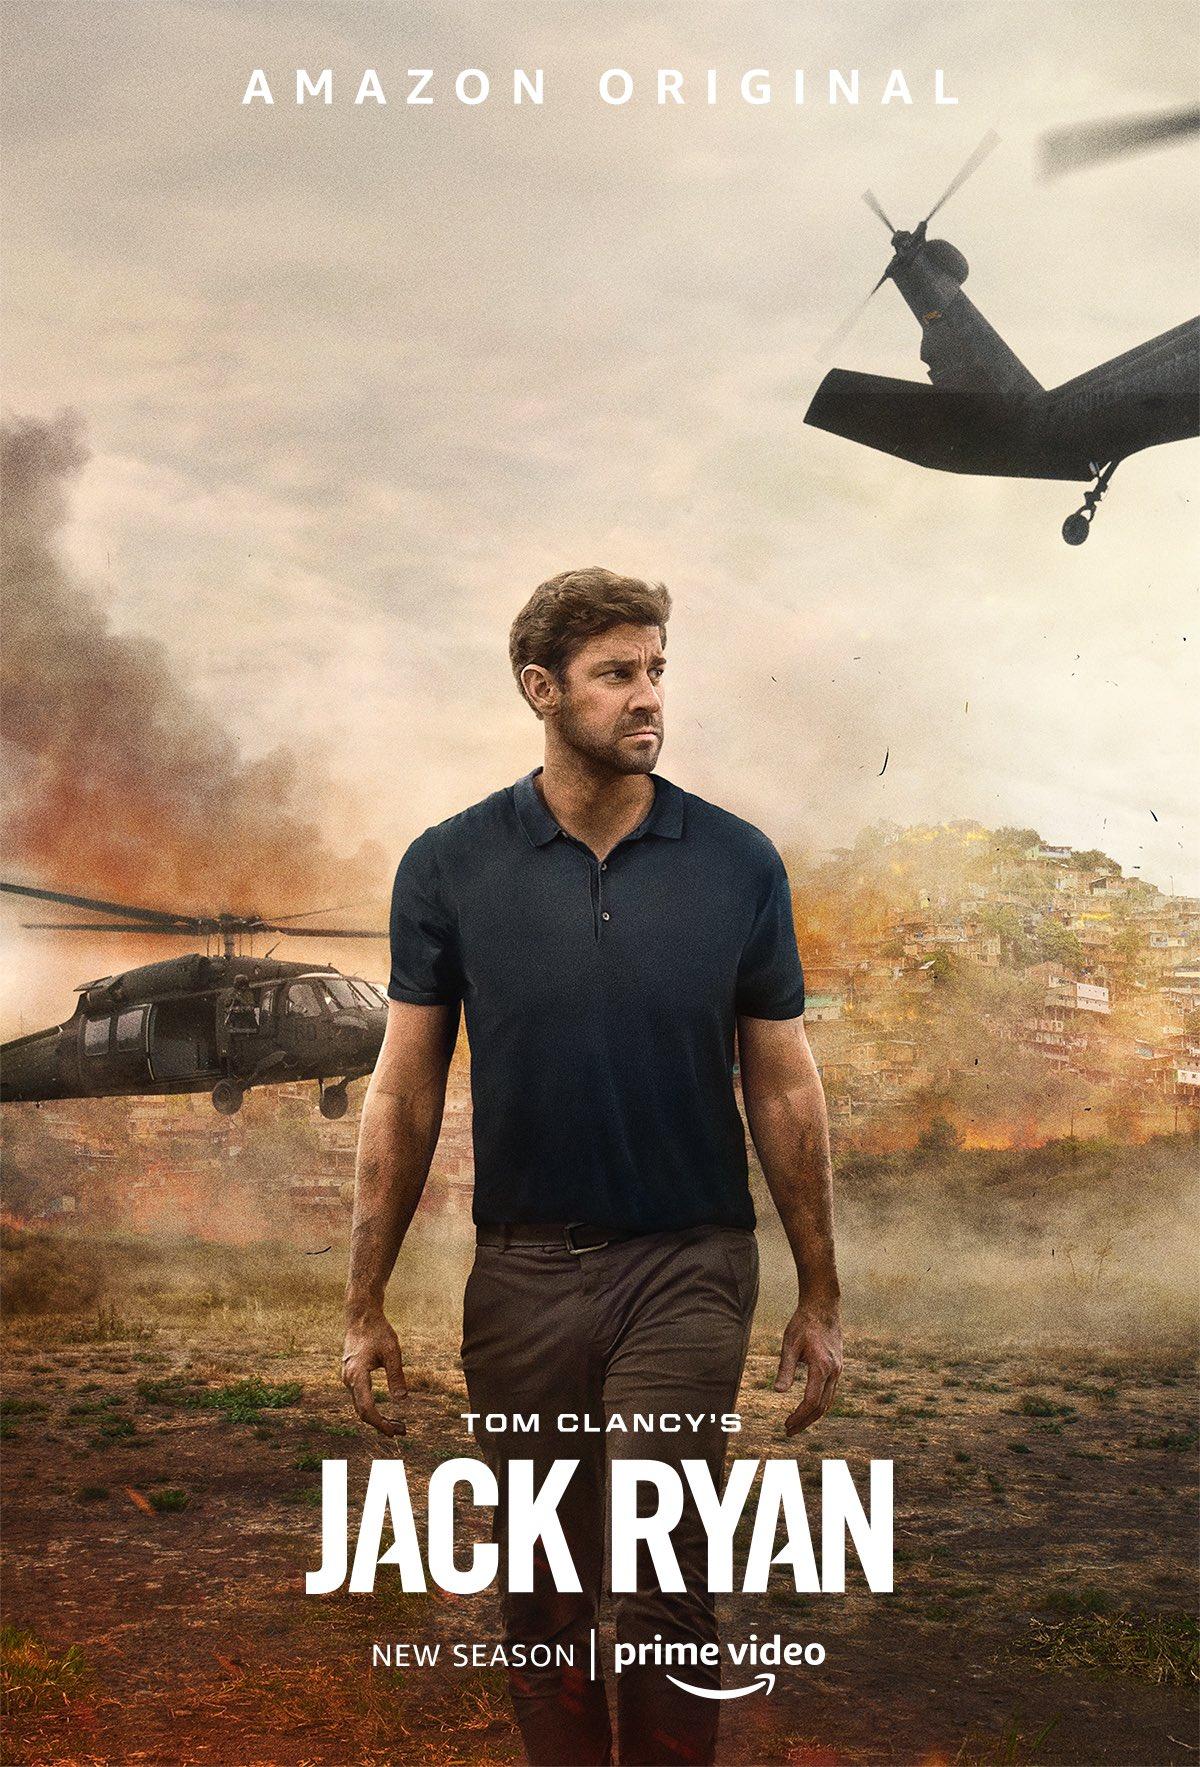 Jack Ryan Season 2 Poster